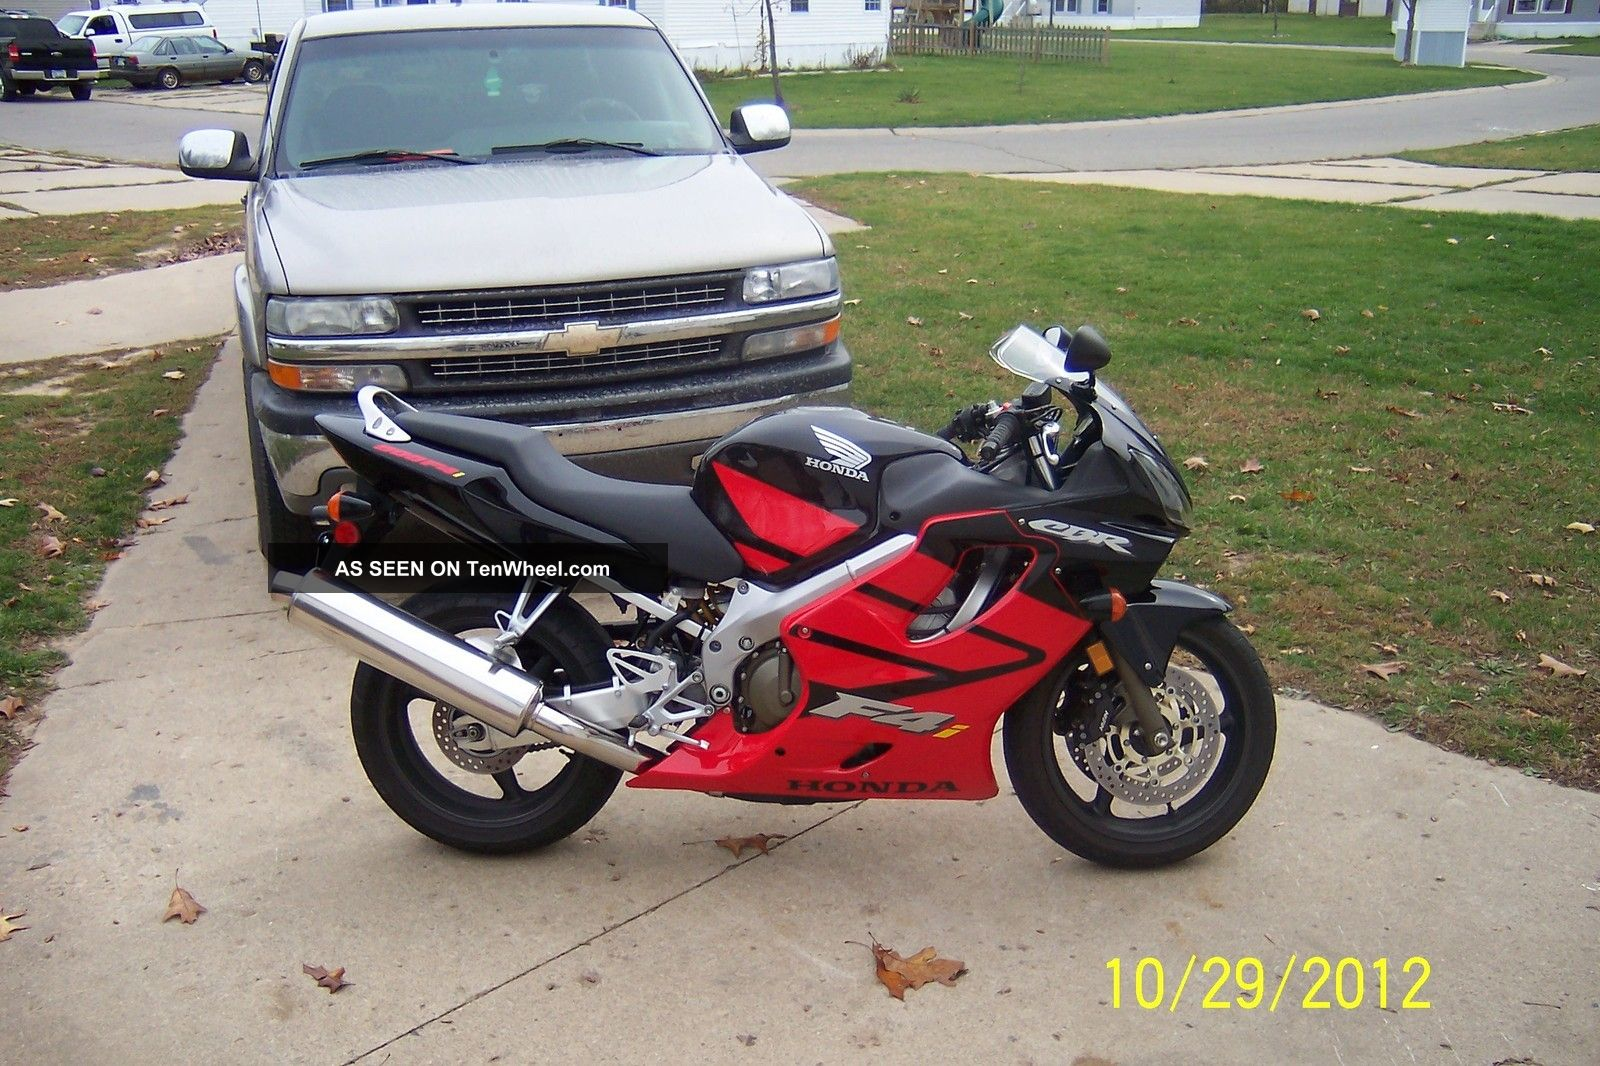 2004 Honda Cbr 600 F4i CBR photo